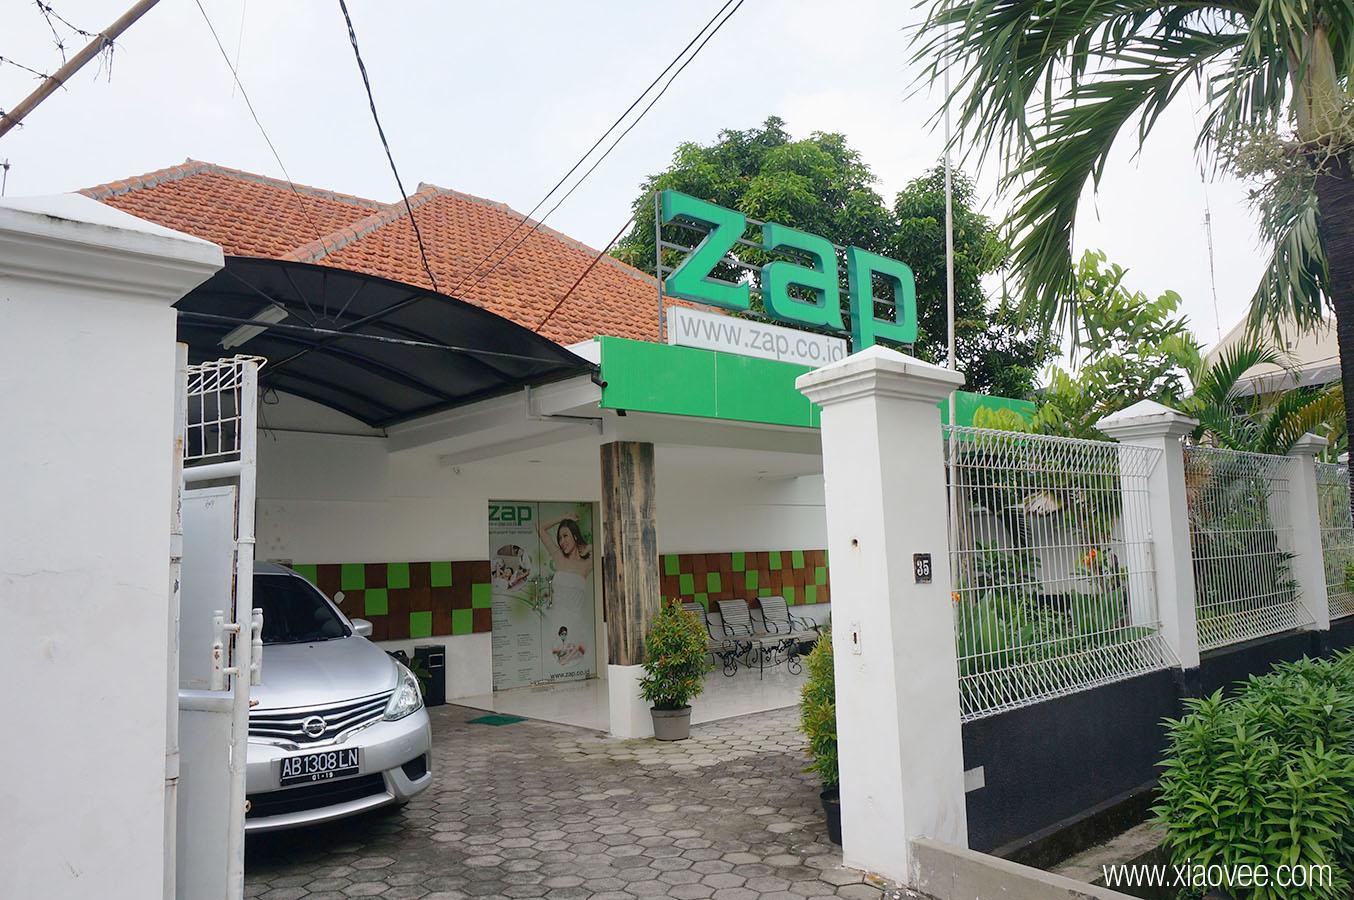 ZAP permanent hair removal, ZAP clinic, ZAP Facial rejuvenation review, ZAP Surabaya